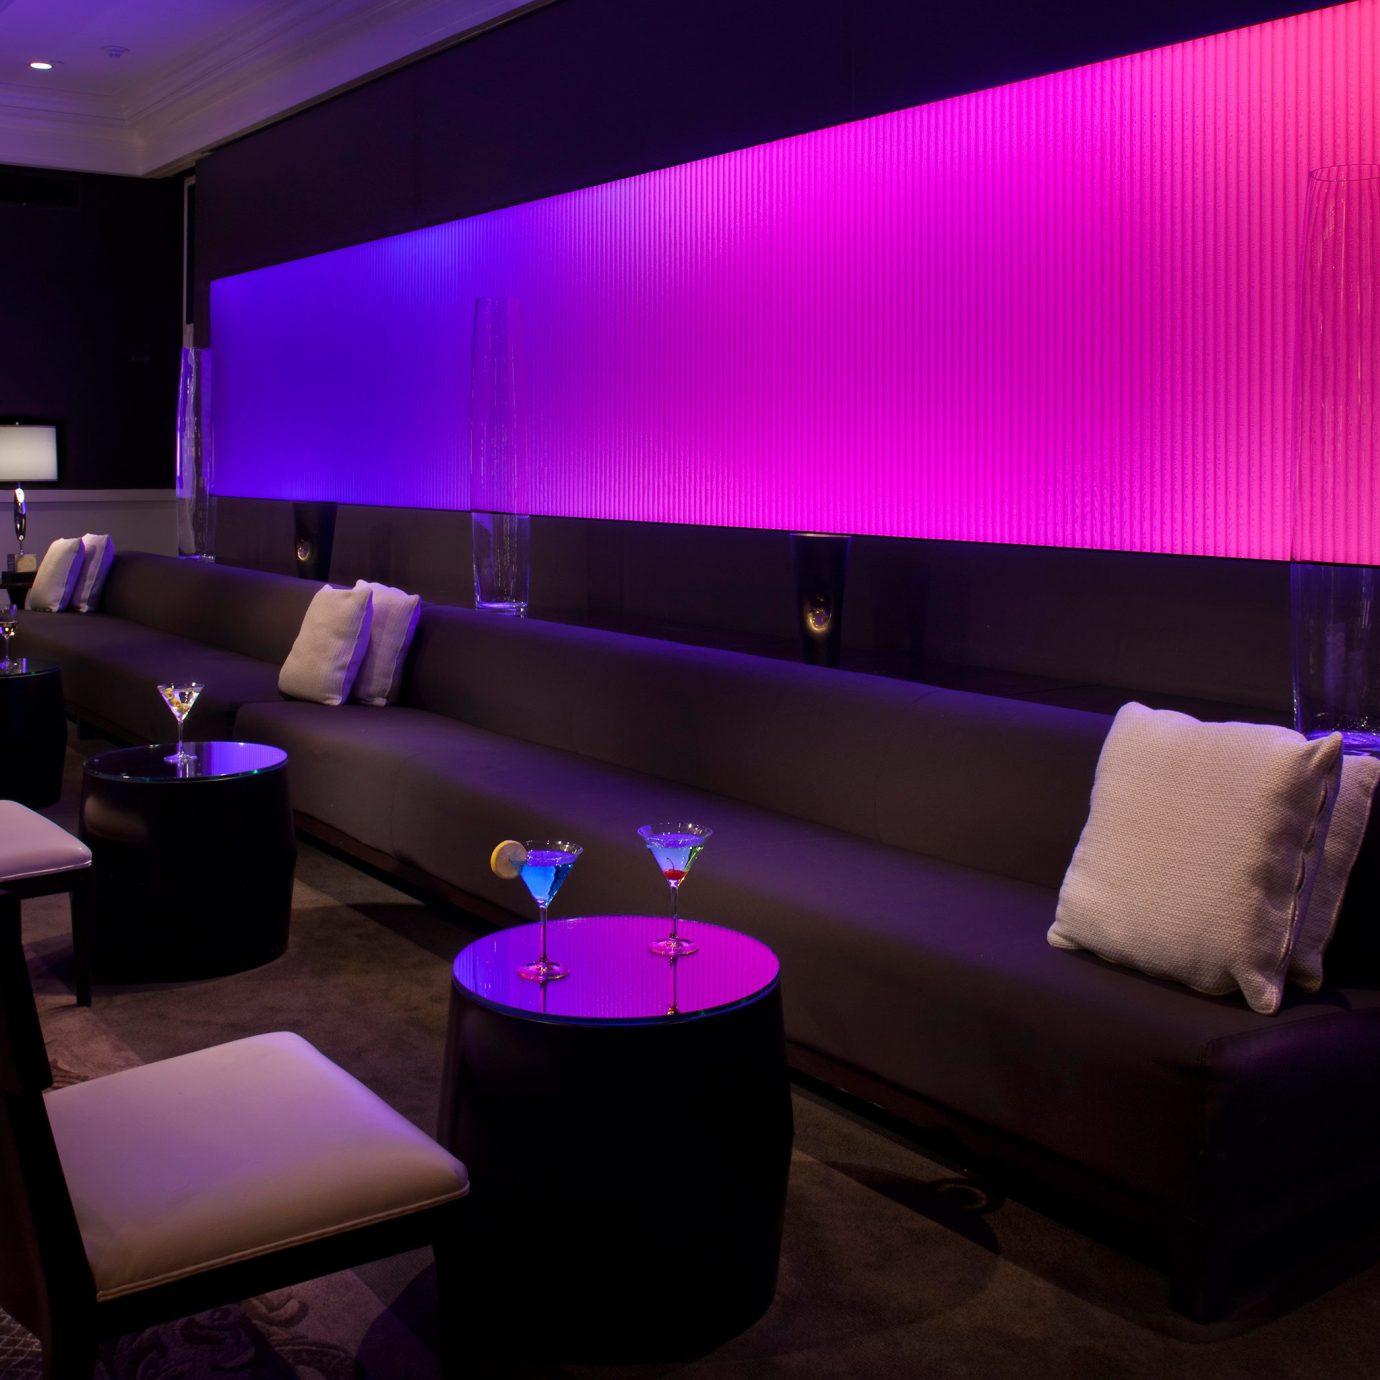 Dining Drink Eat Lounge Modern purple auditorium function hall Bar nightclub flat lamp